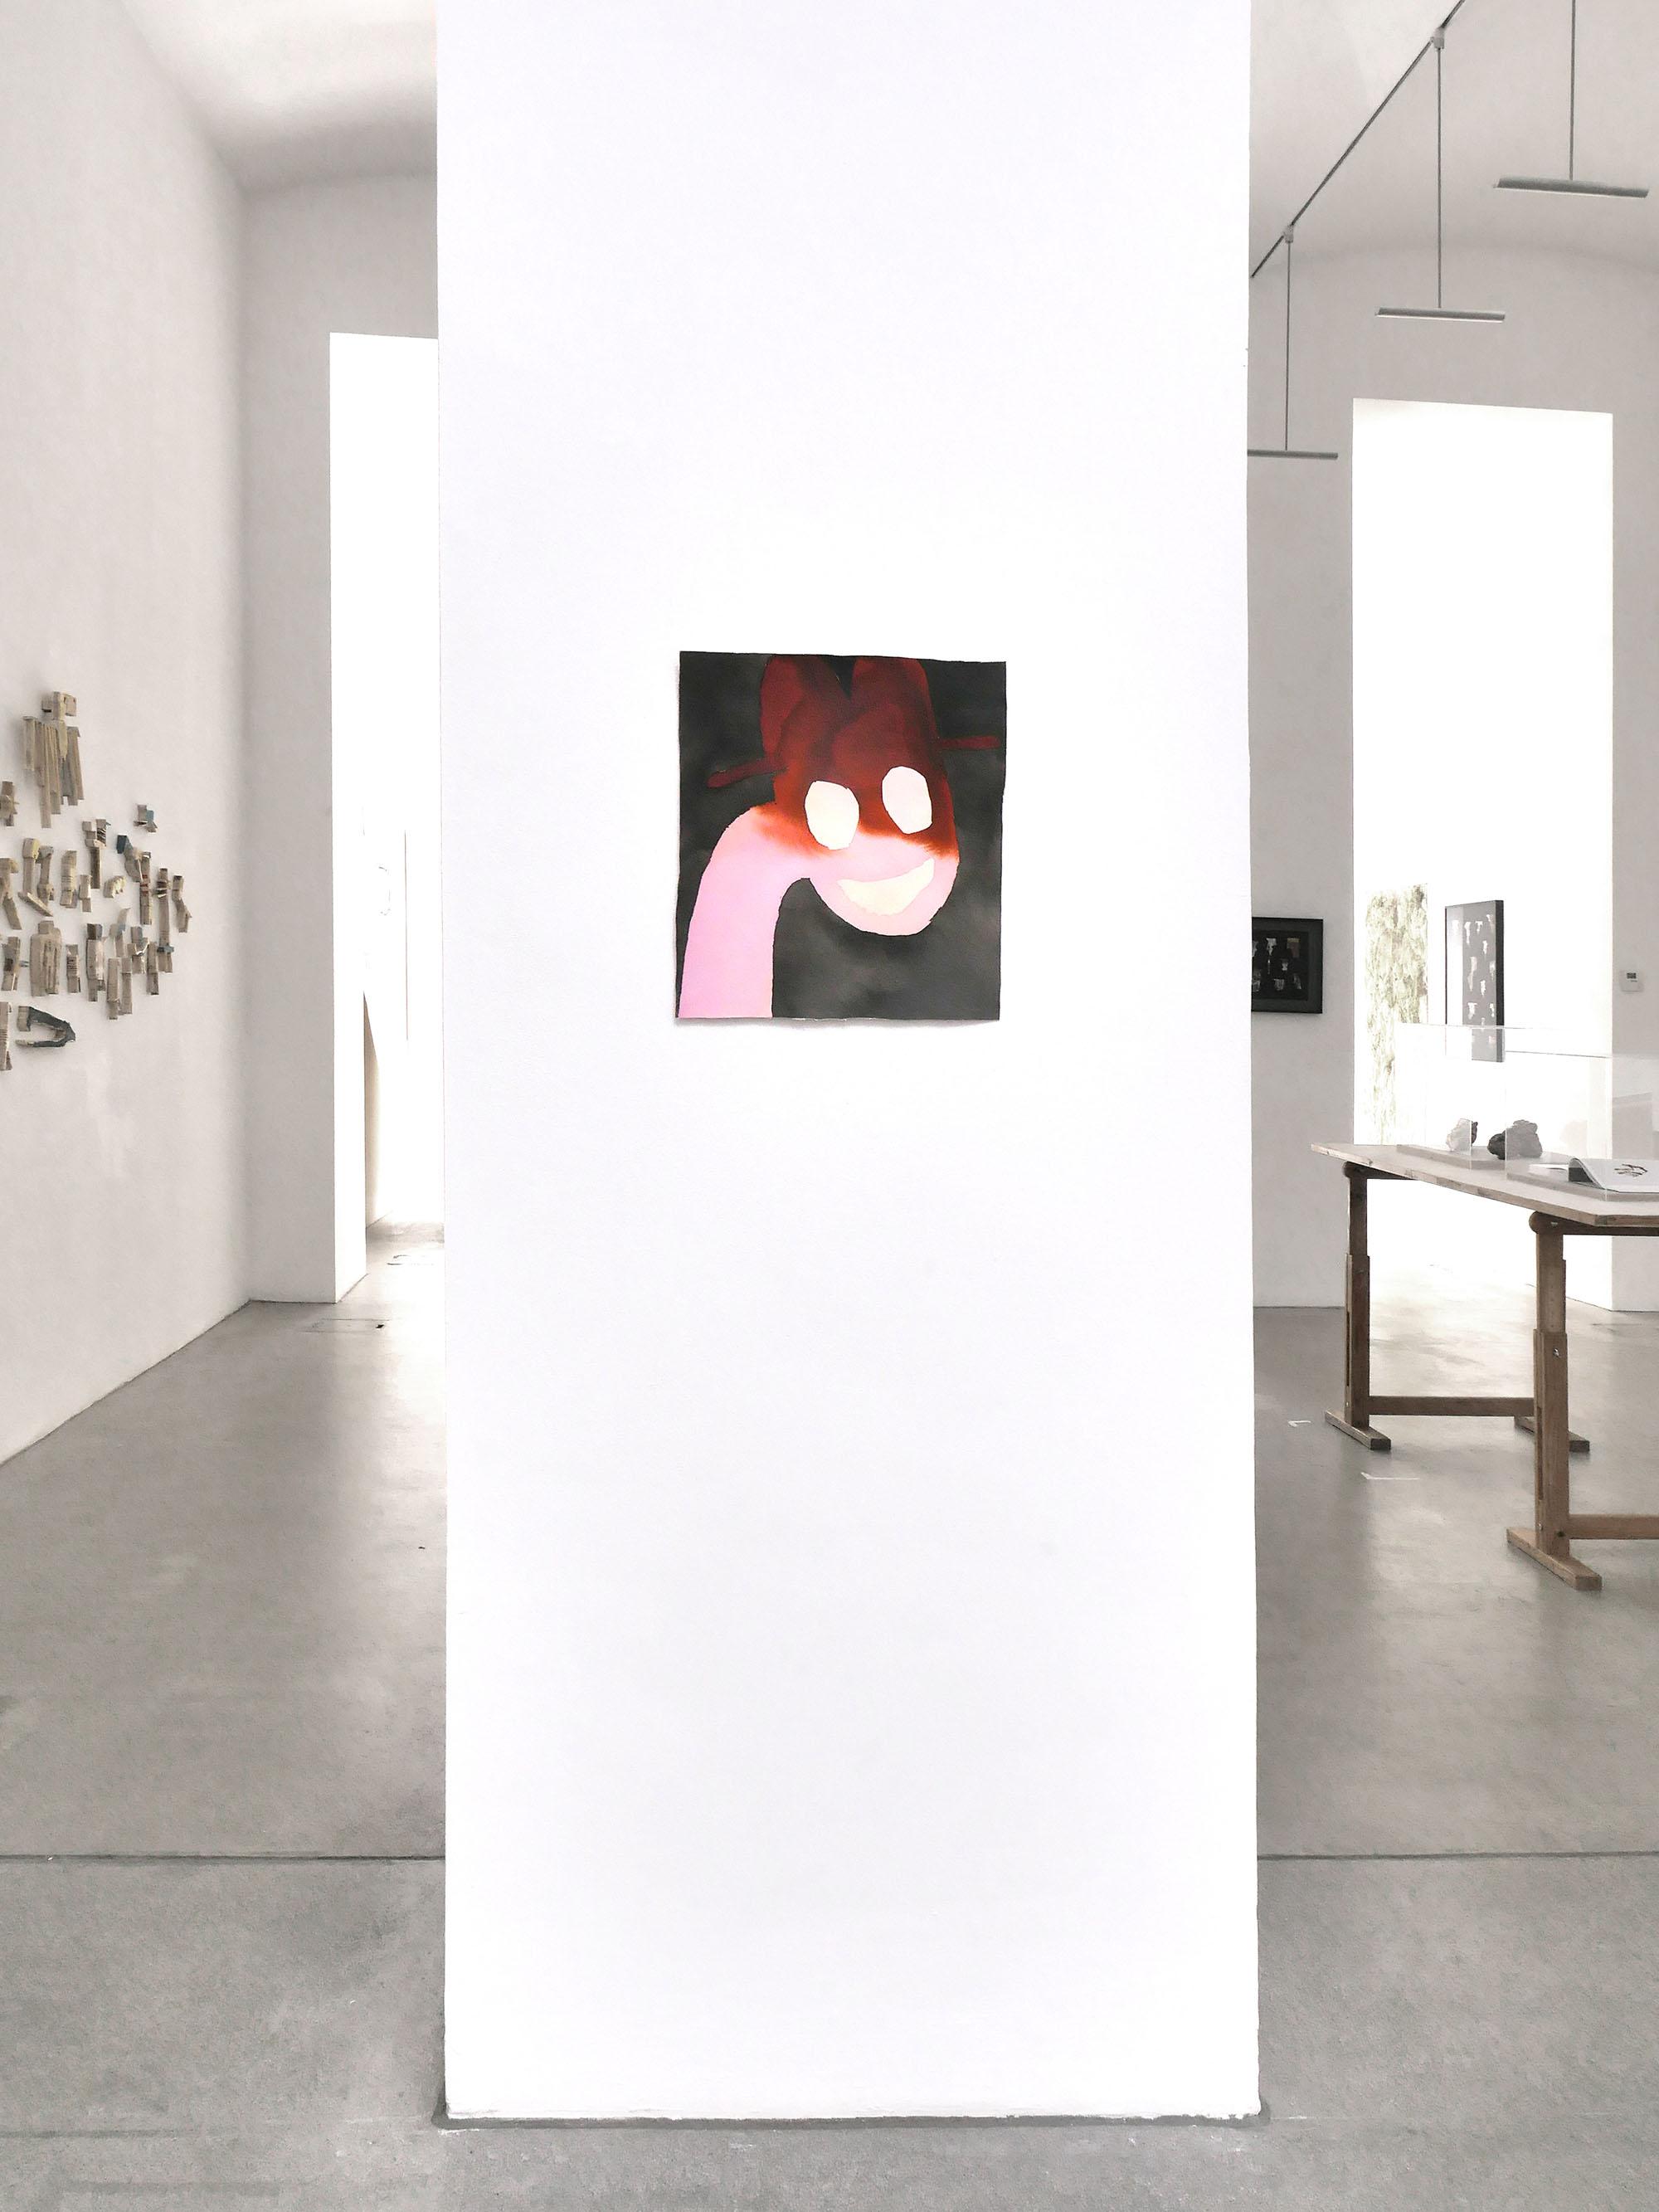 applied arts, painter, printmaker, collaboration, domino, exhibition,